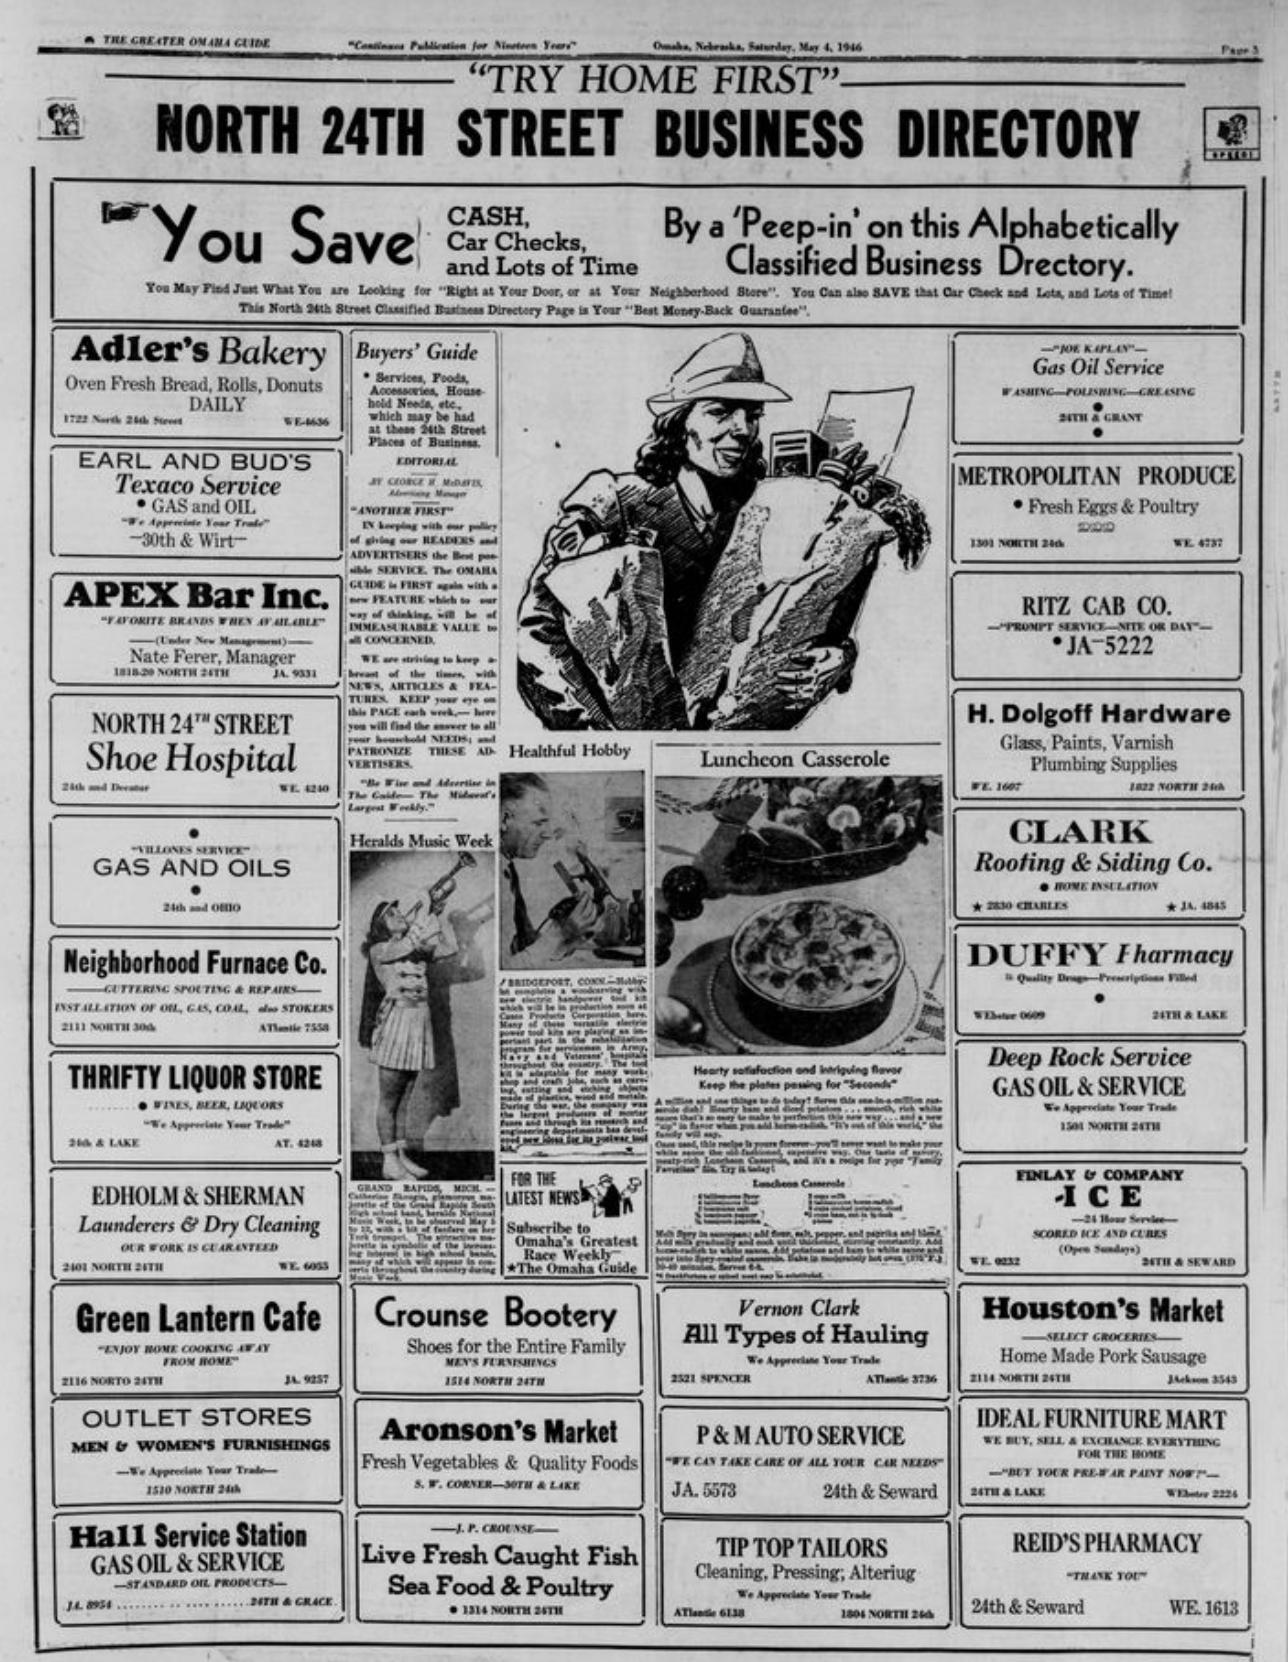 1940 Omaha Guide North 24th Street Directory, North Omaha, Nebraska